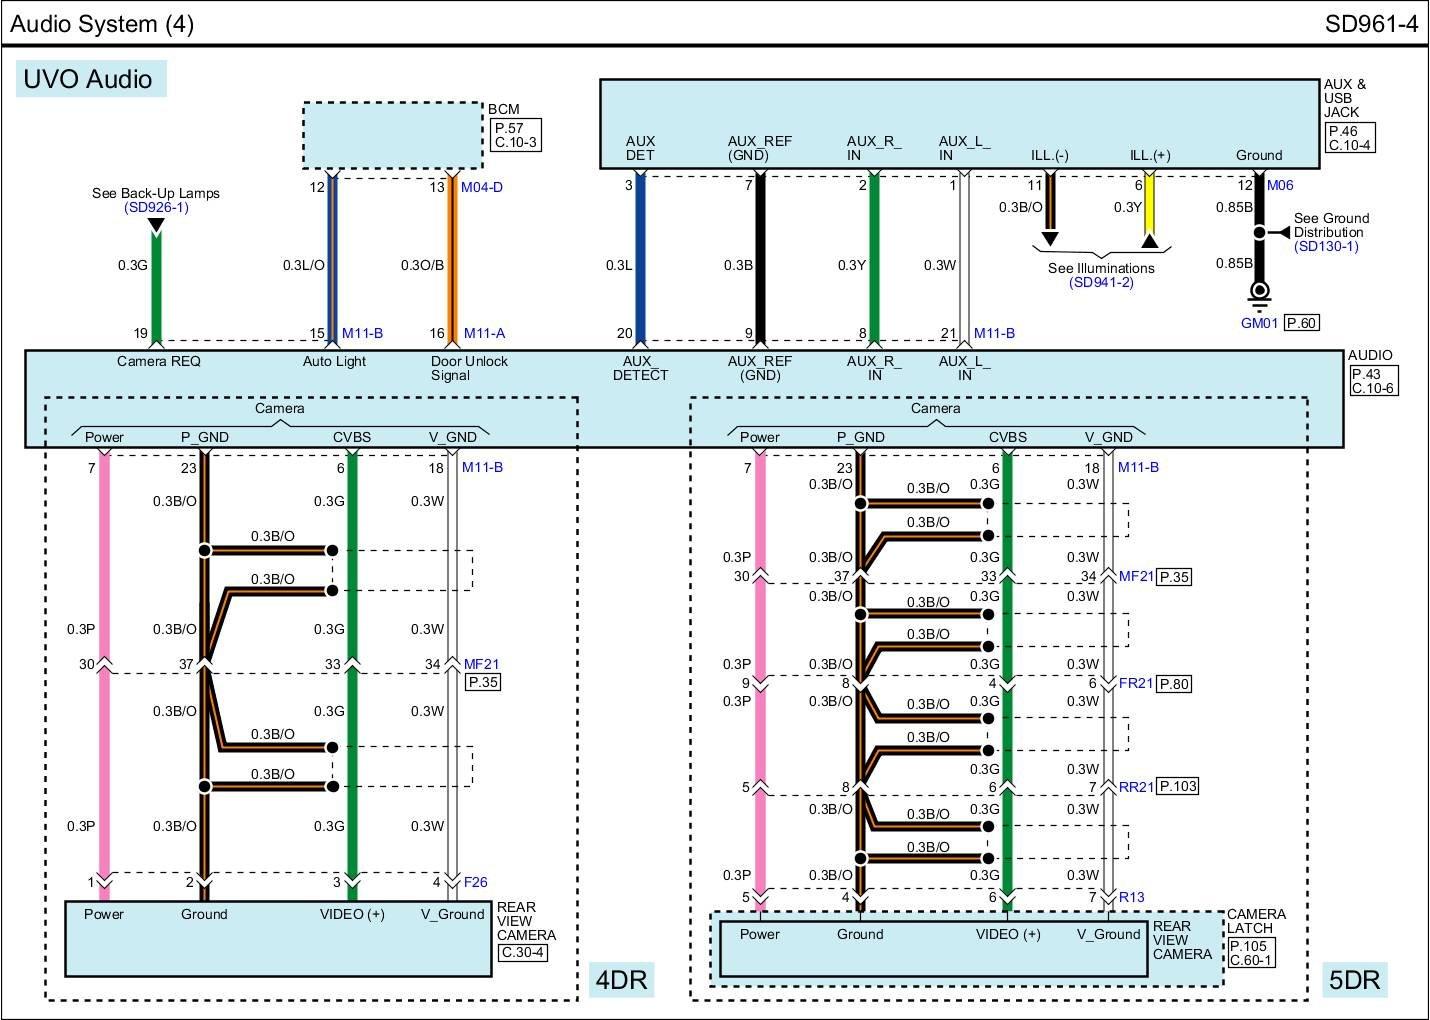 Wiring Diagram For 2013 Kia Rio SX With Navigation